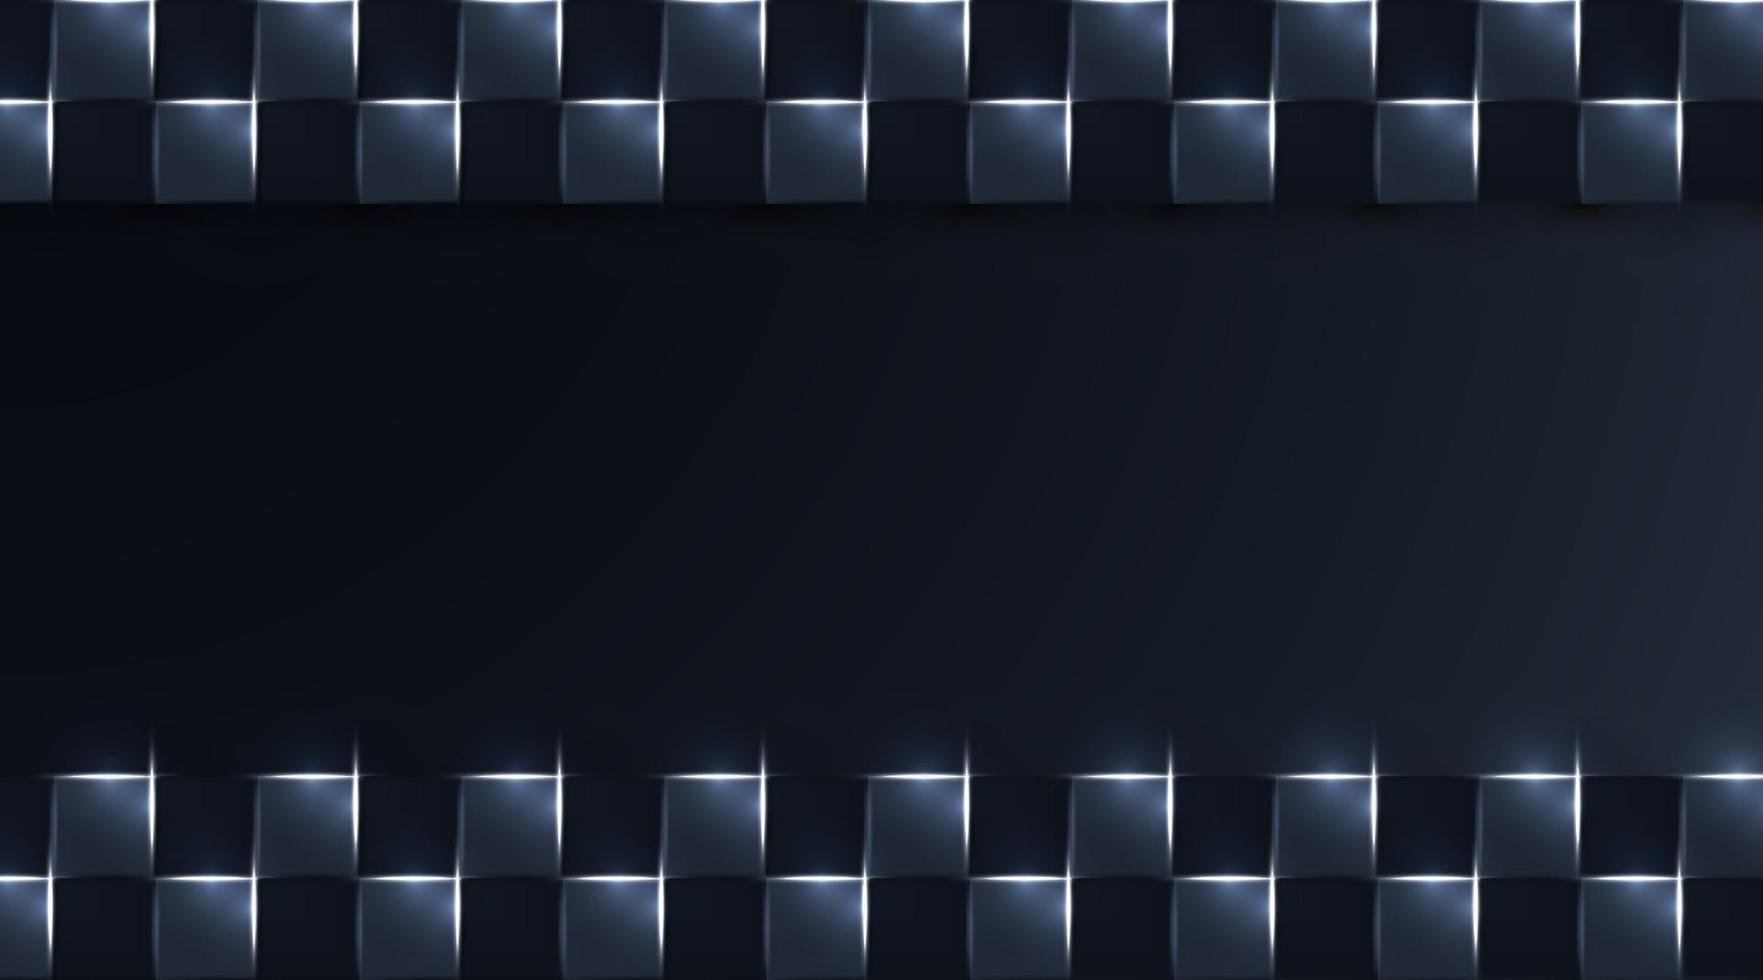 square realistic geometric dark background. white shine light, vector illustration